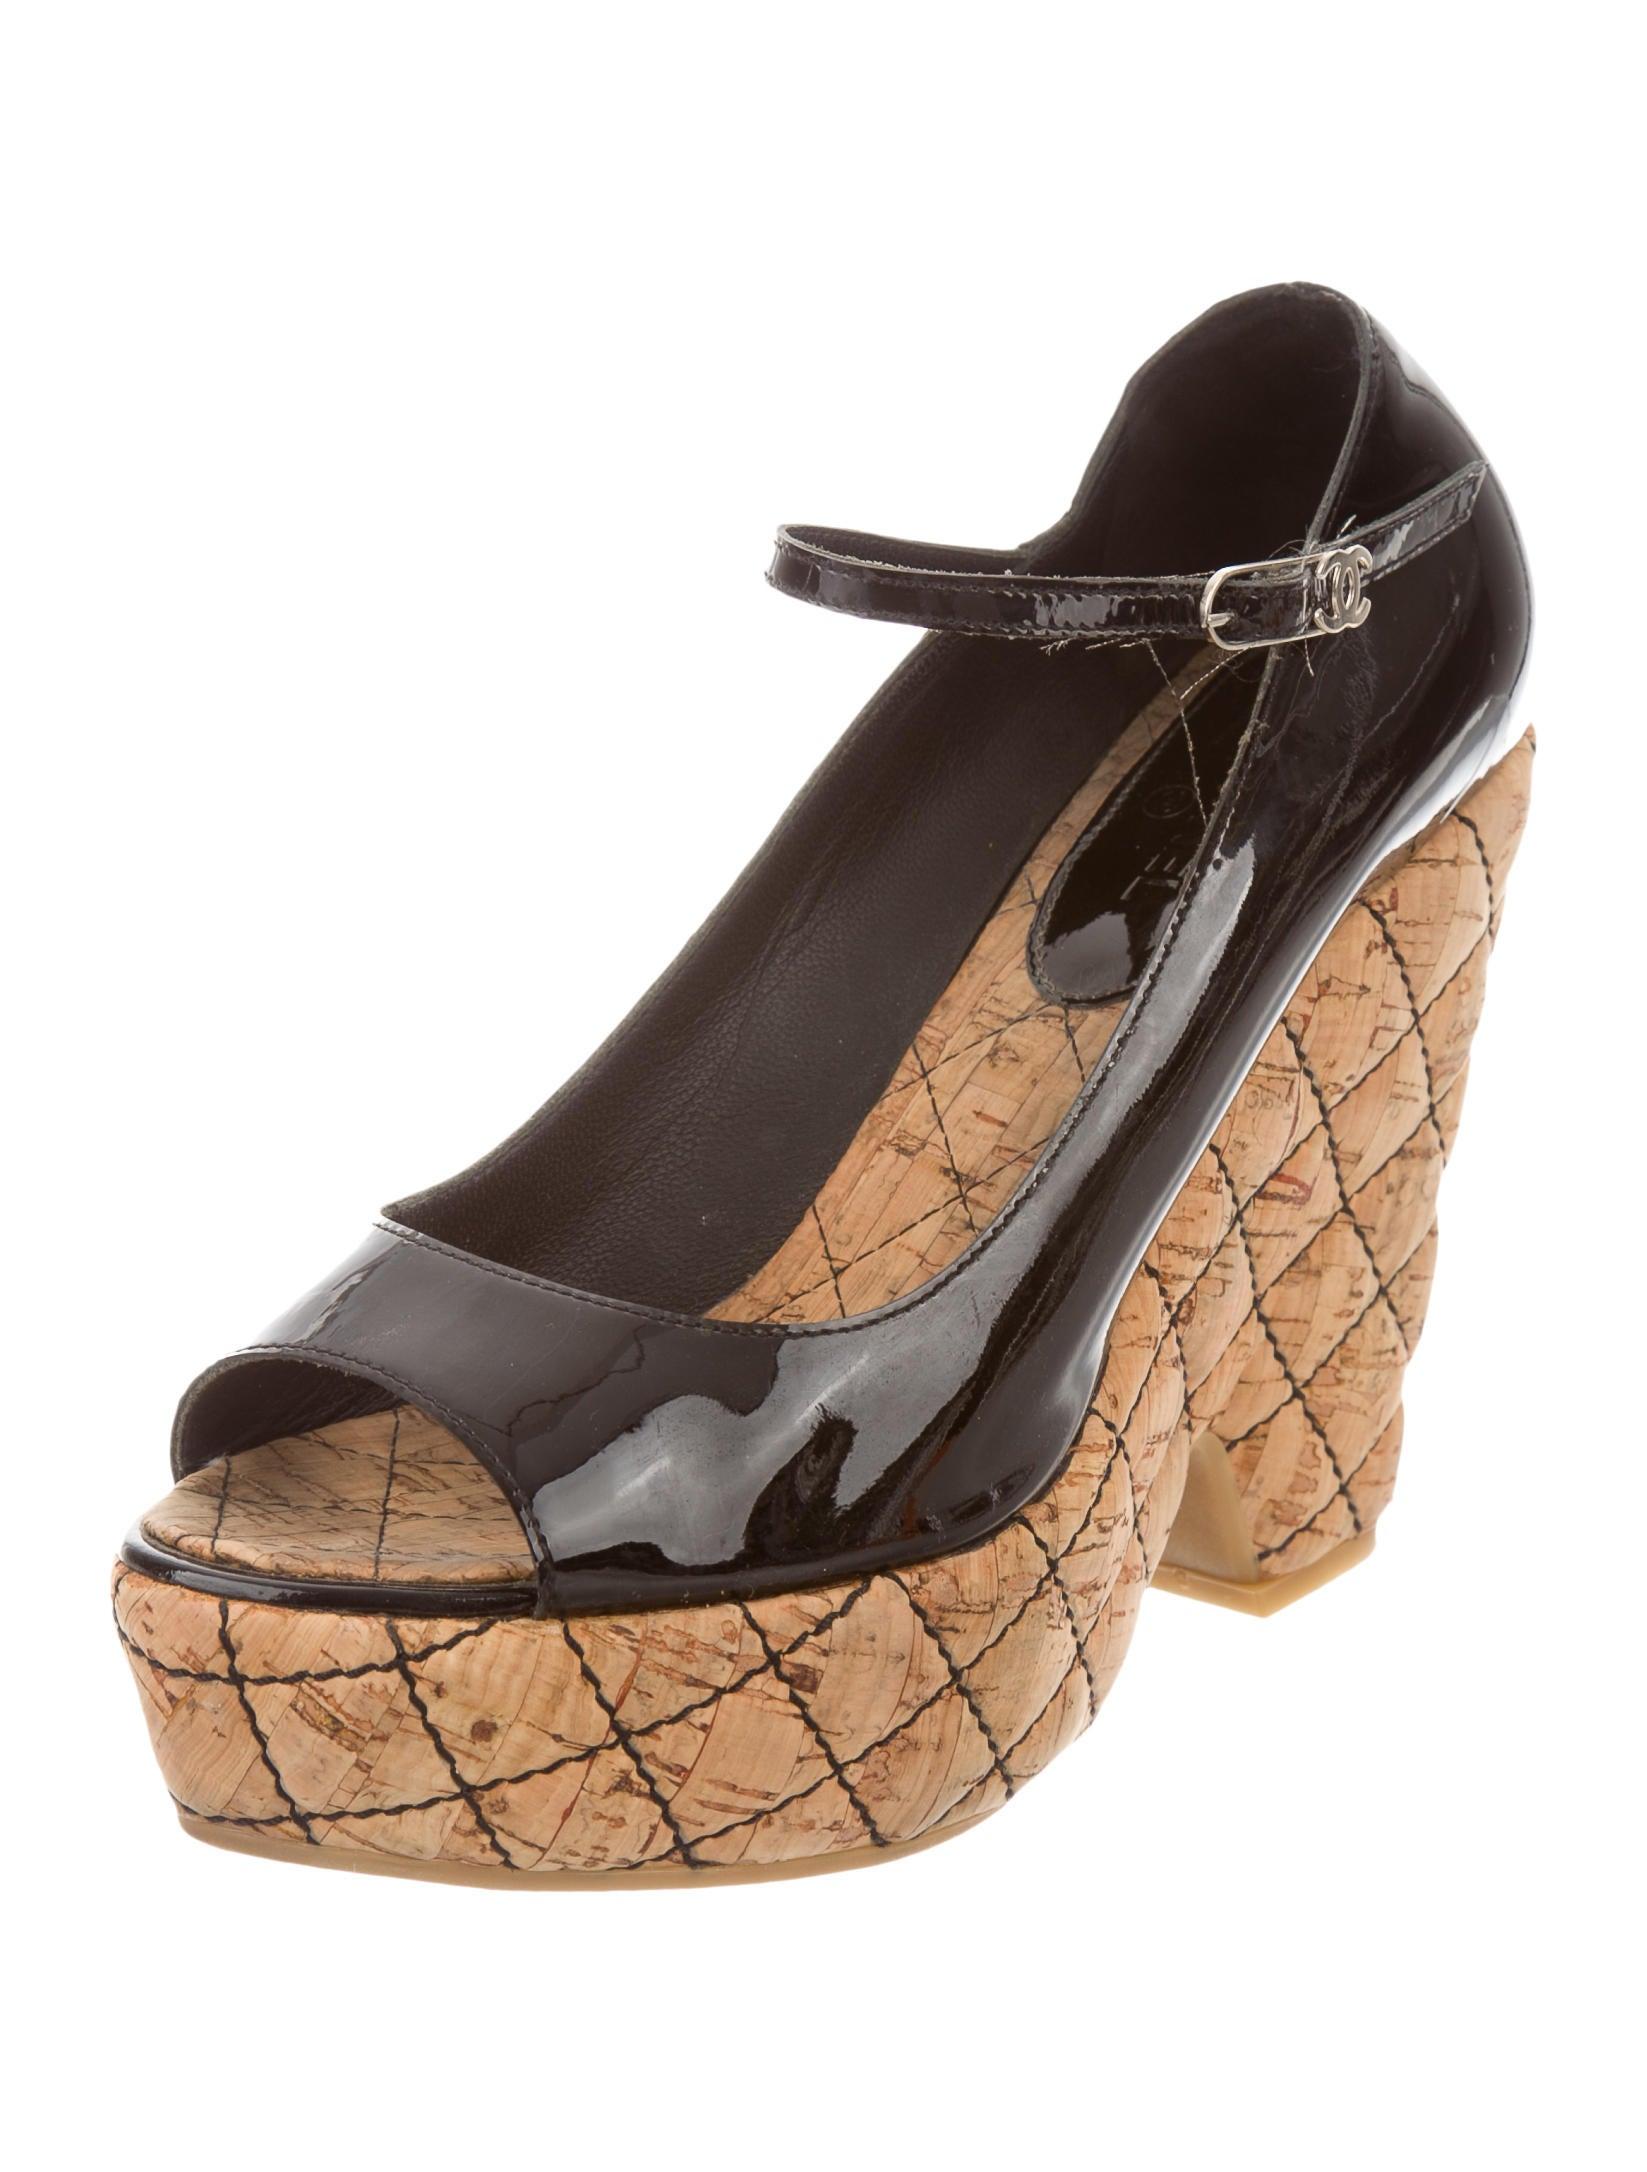 chanel peep toe platform pumps shoes cha130565 the